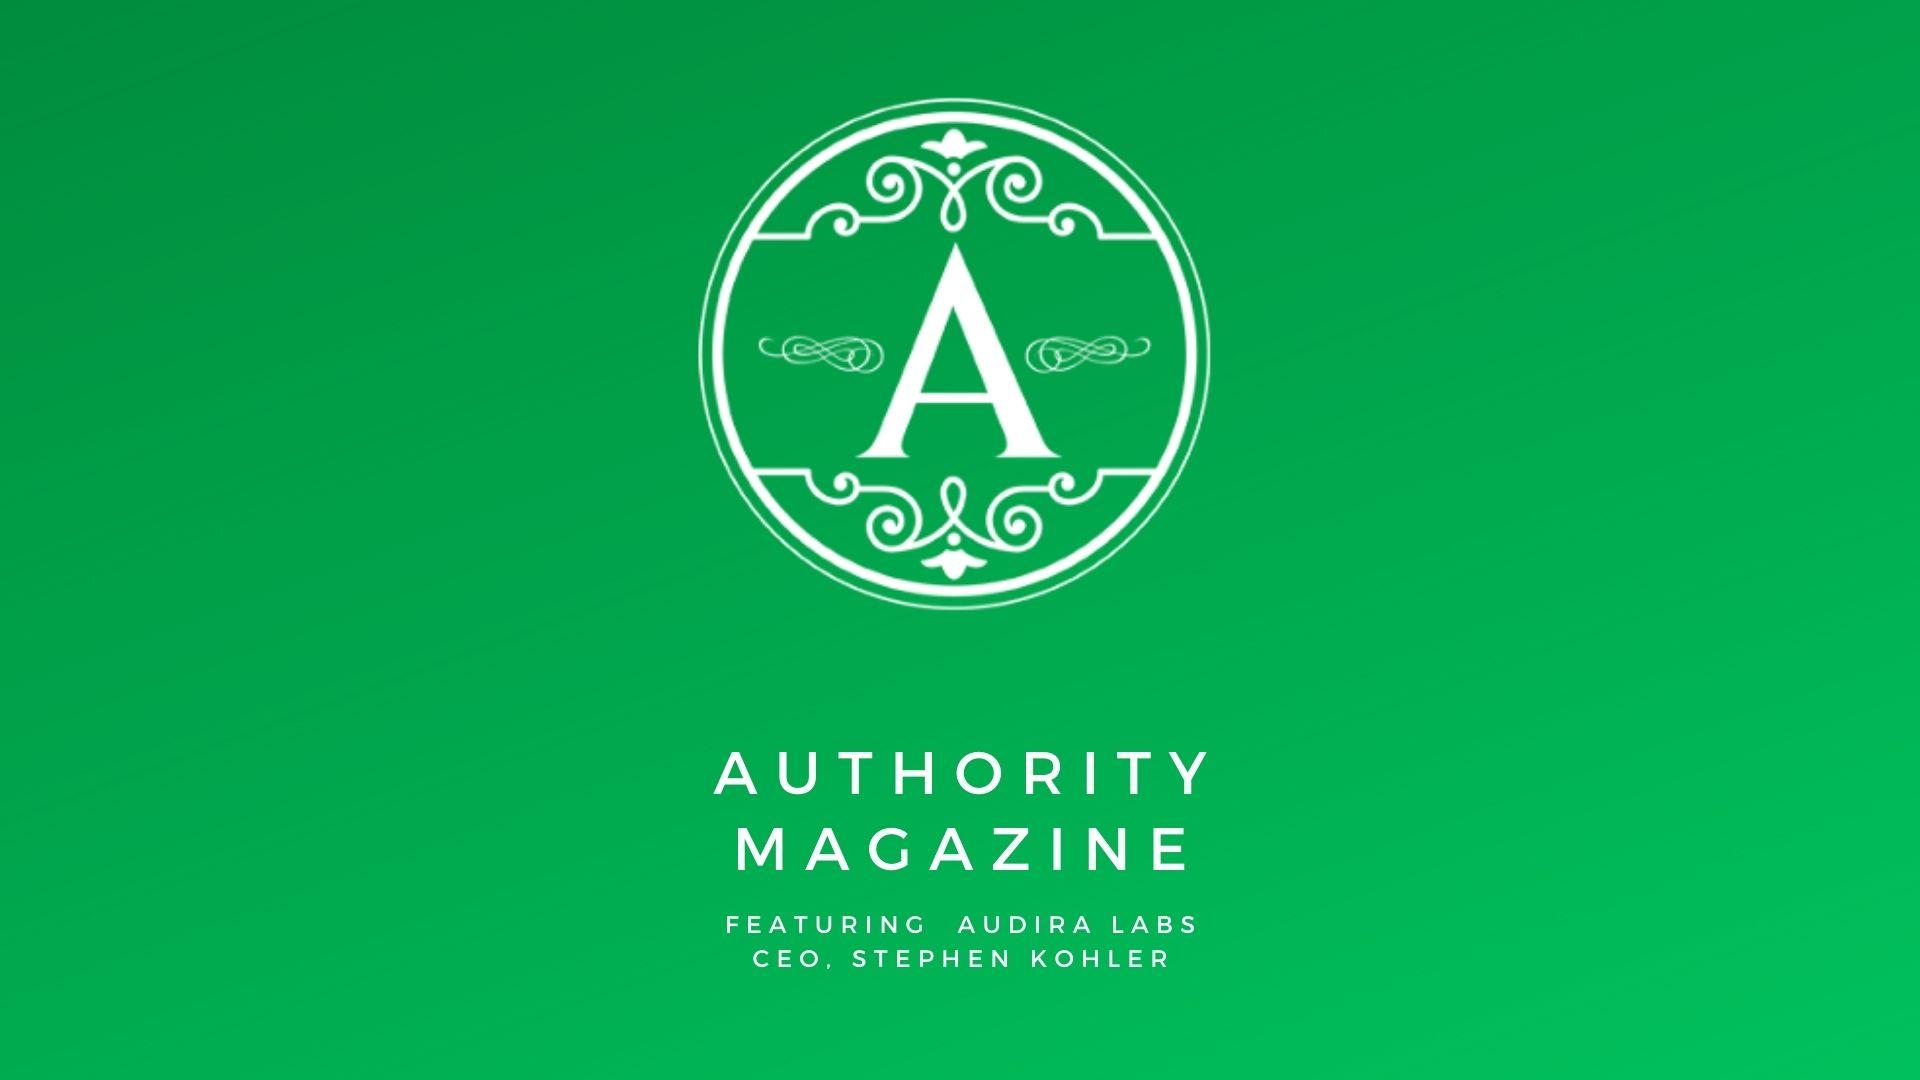 Authority Magazine Interviews Audira on Engagement